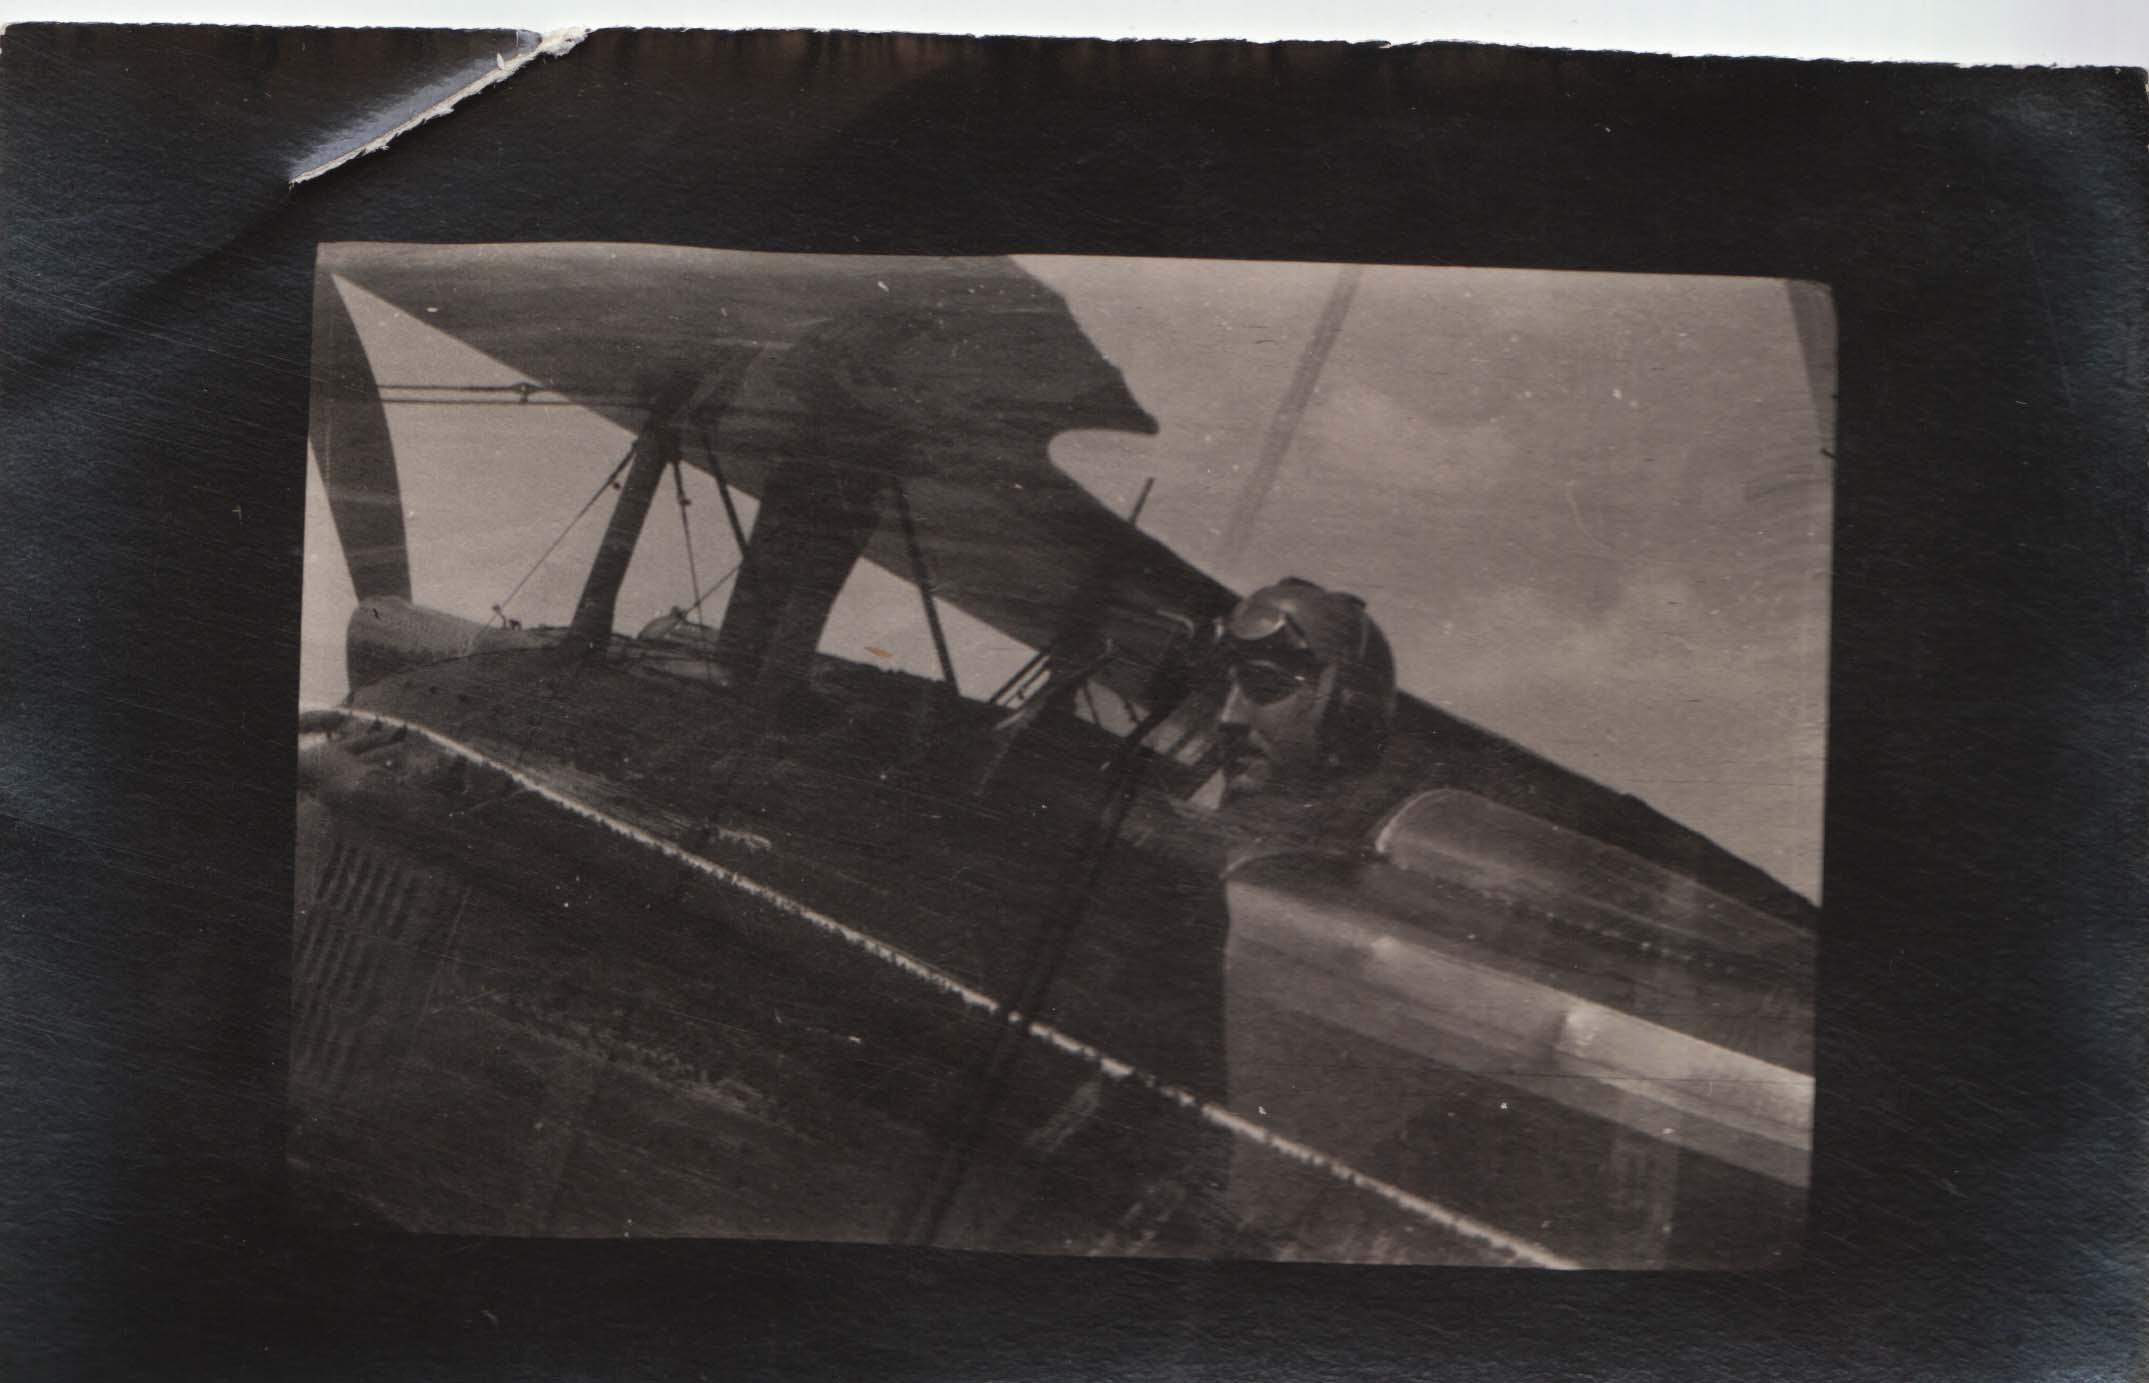 0453 Pilot on plane